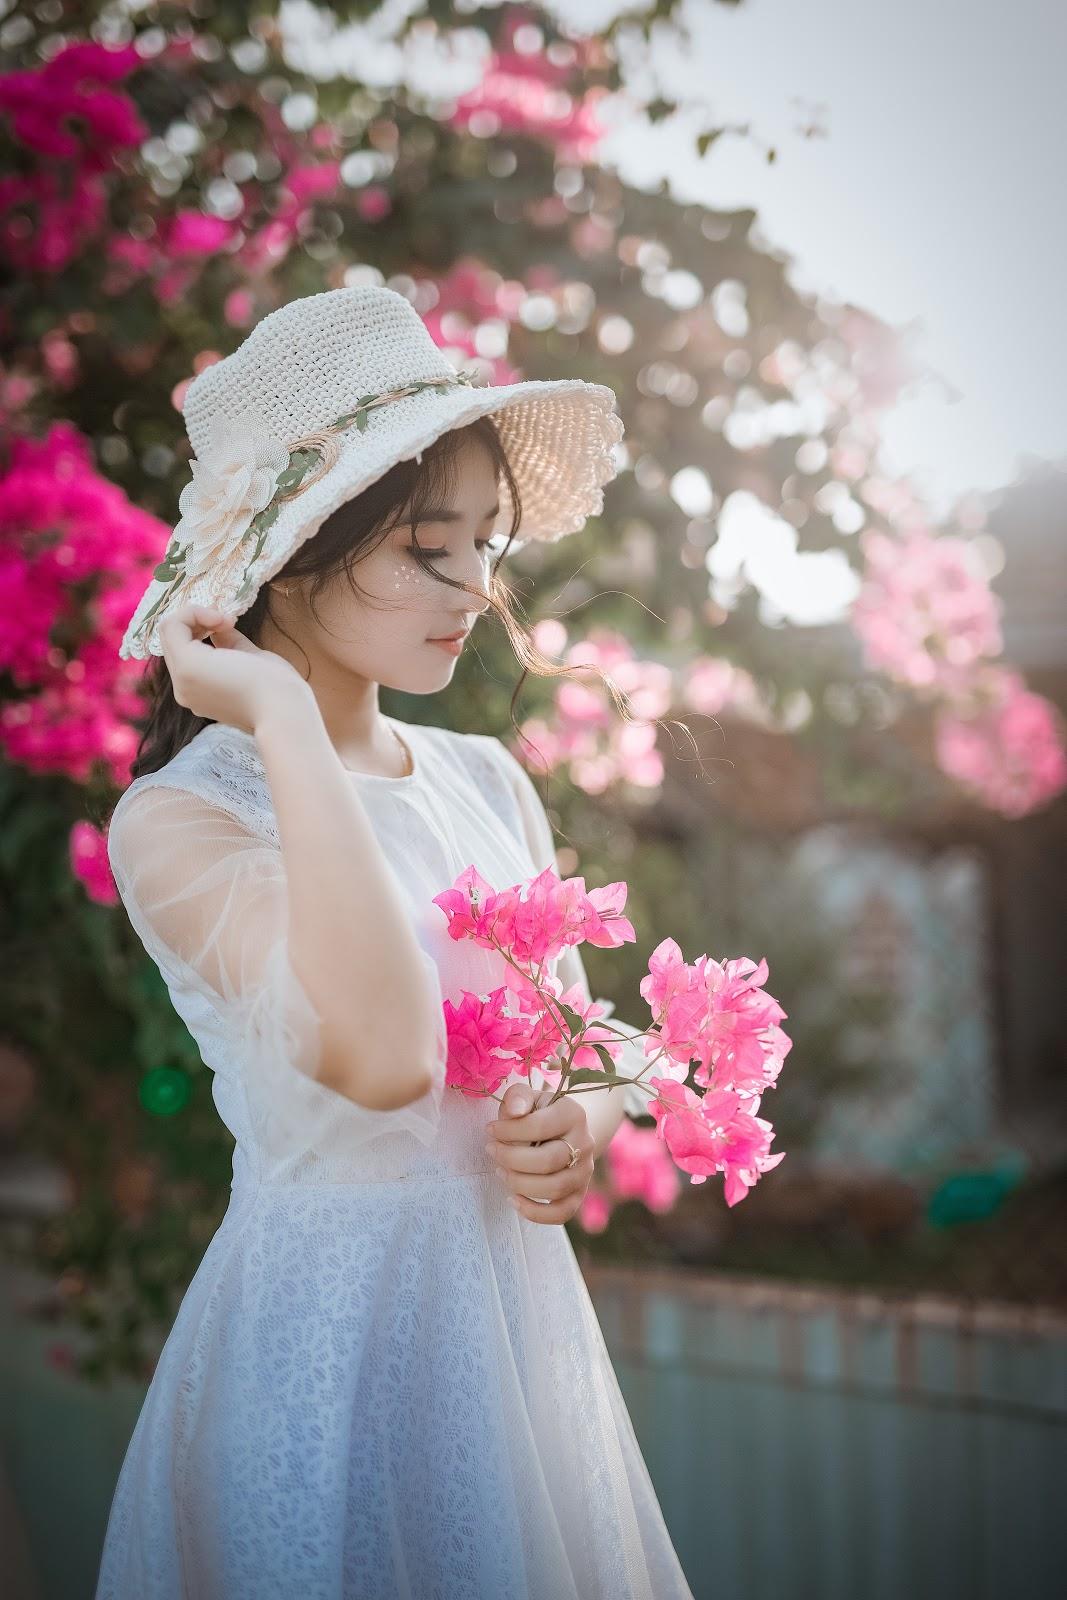 Bio-oil-Cô gái cầm hoa.